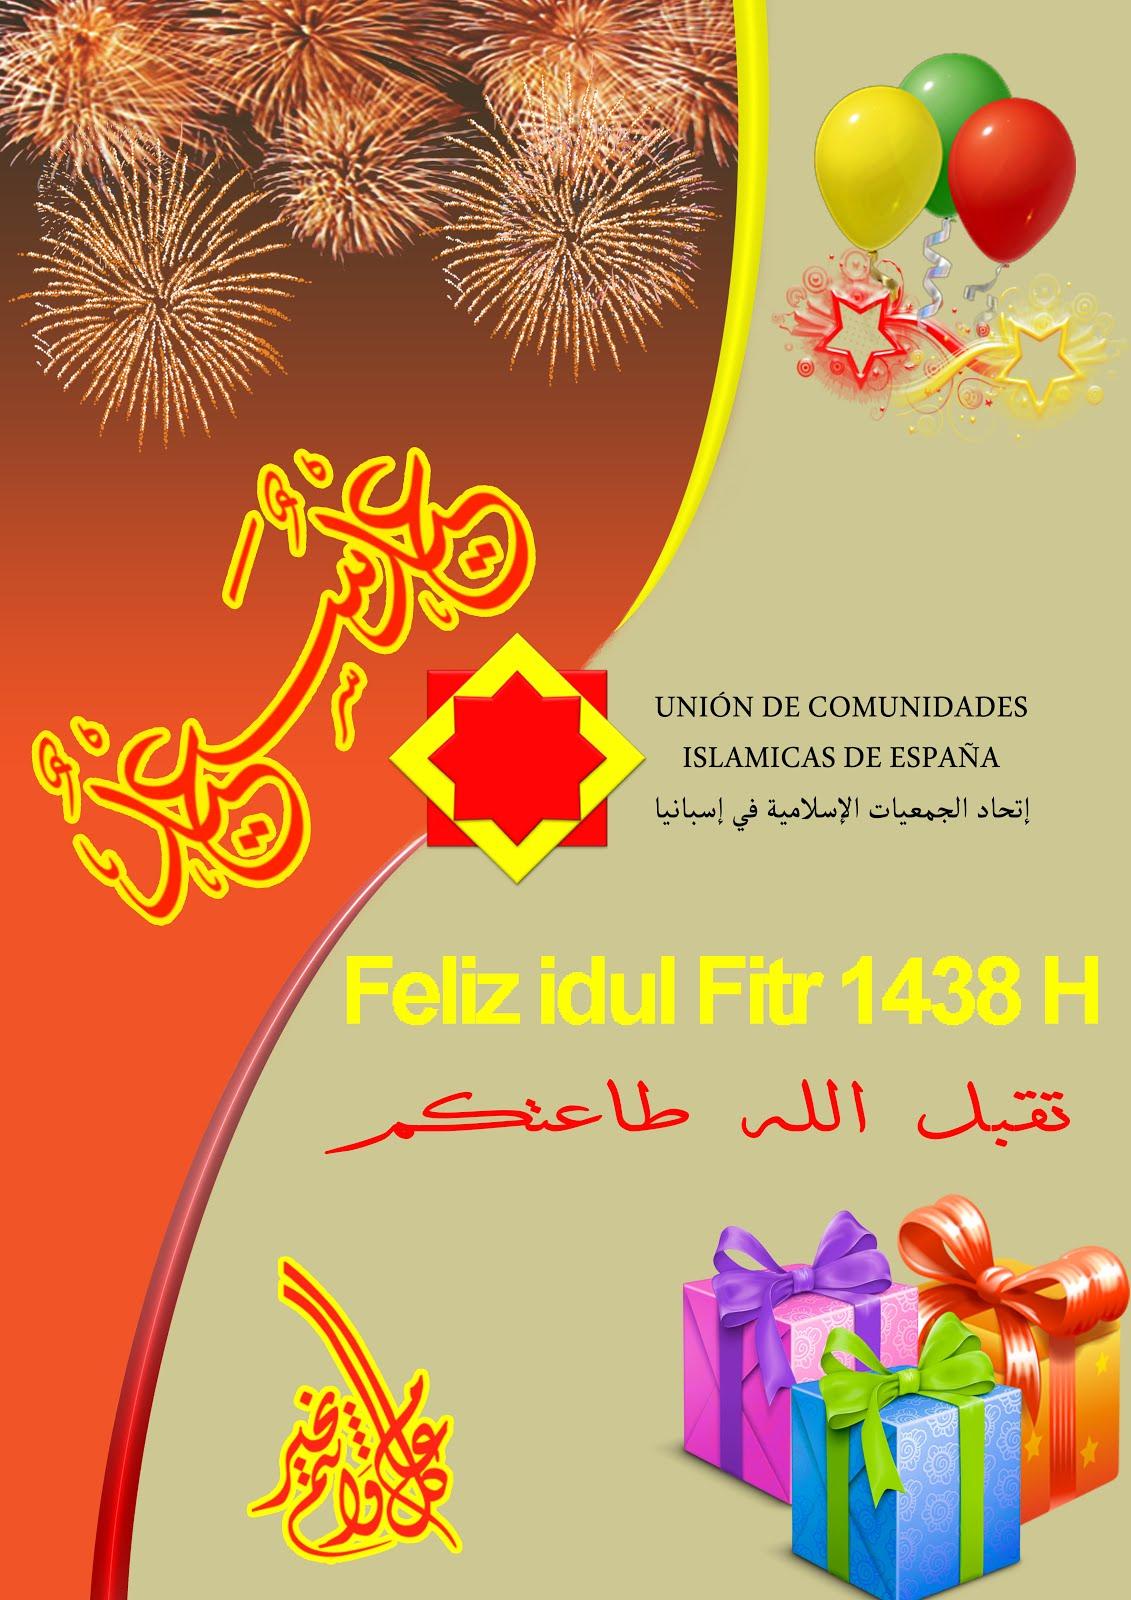 Idul Fitr 1438 H 2017